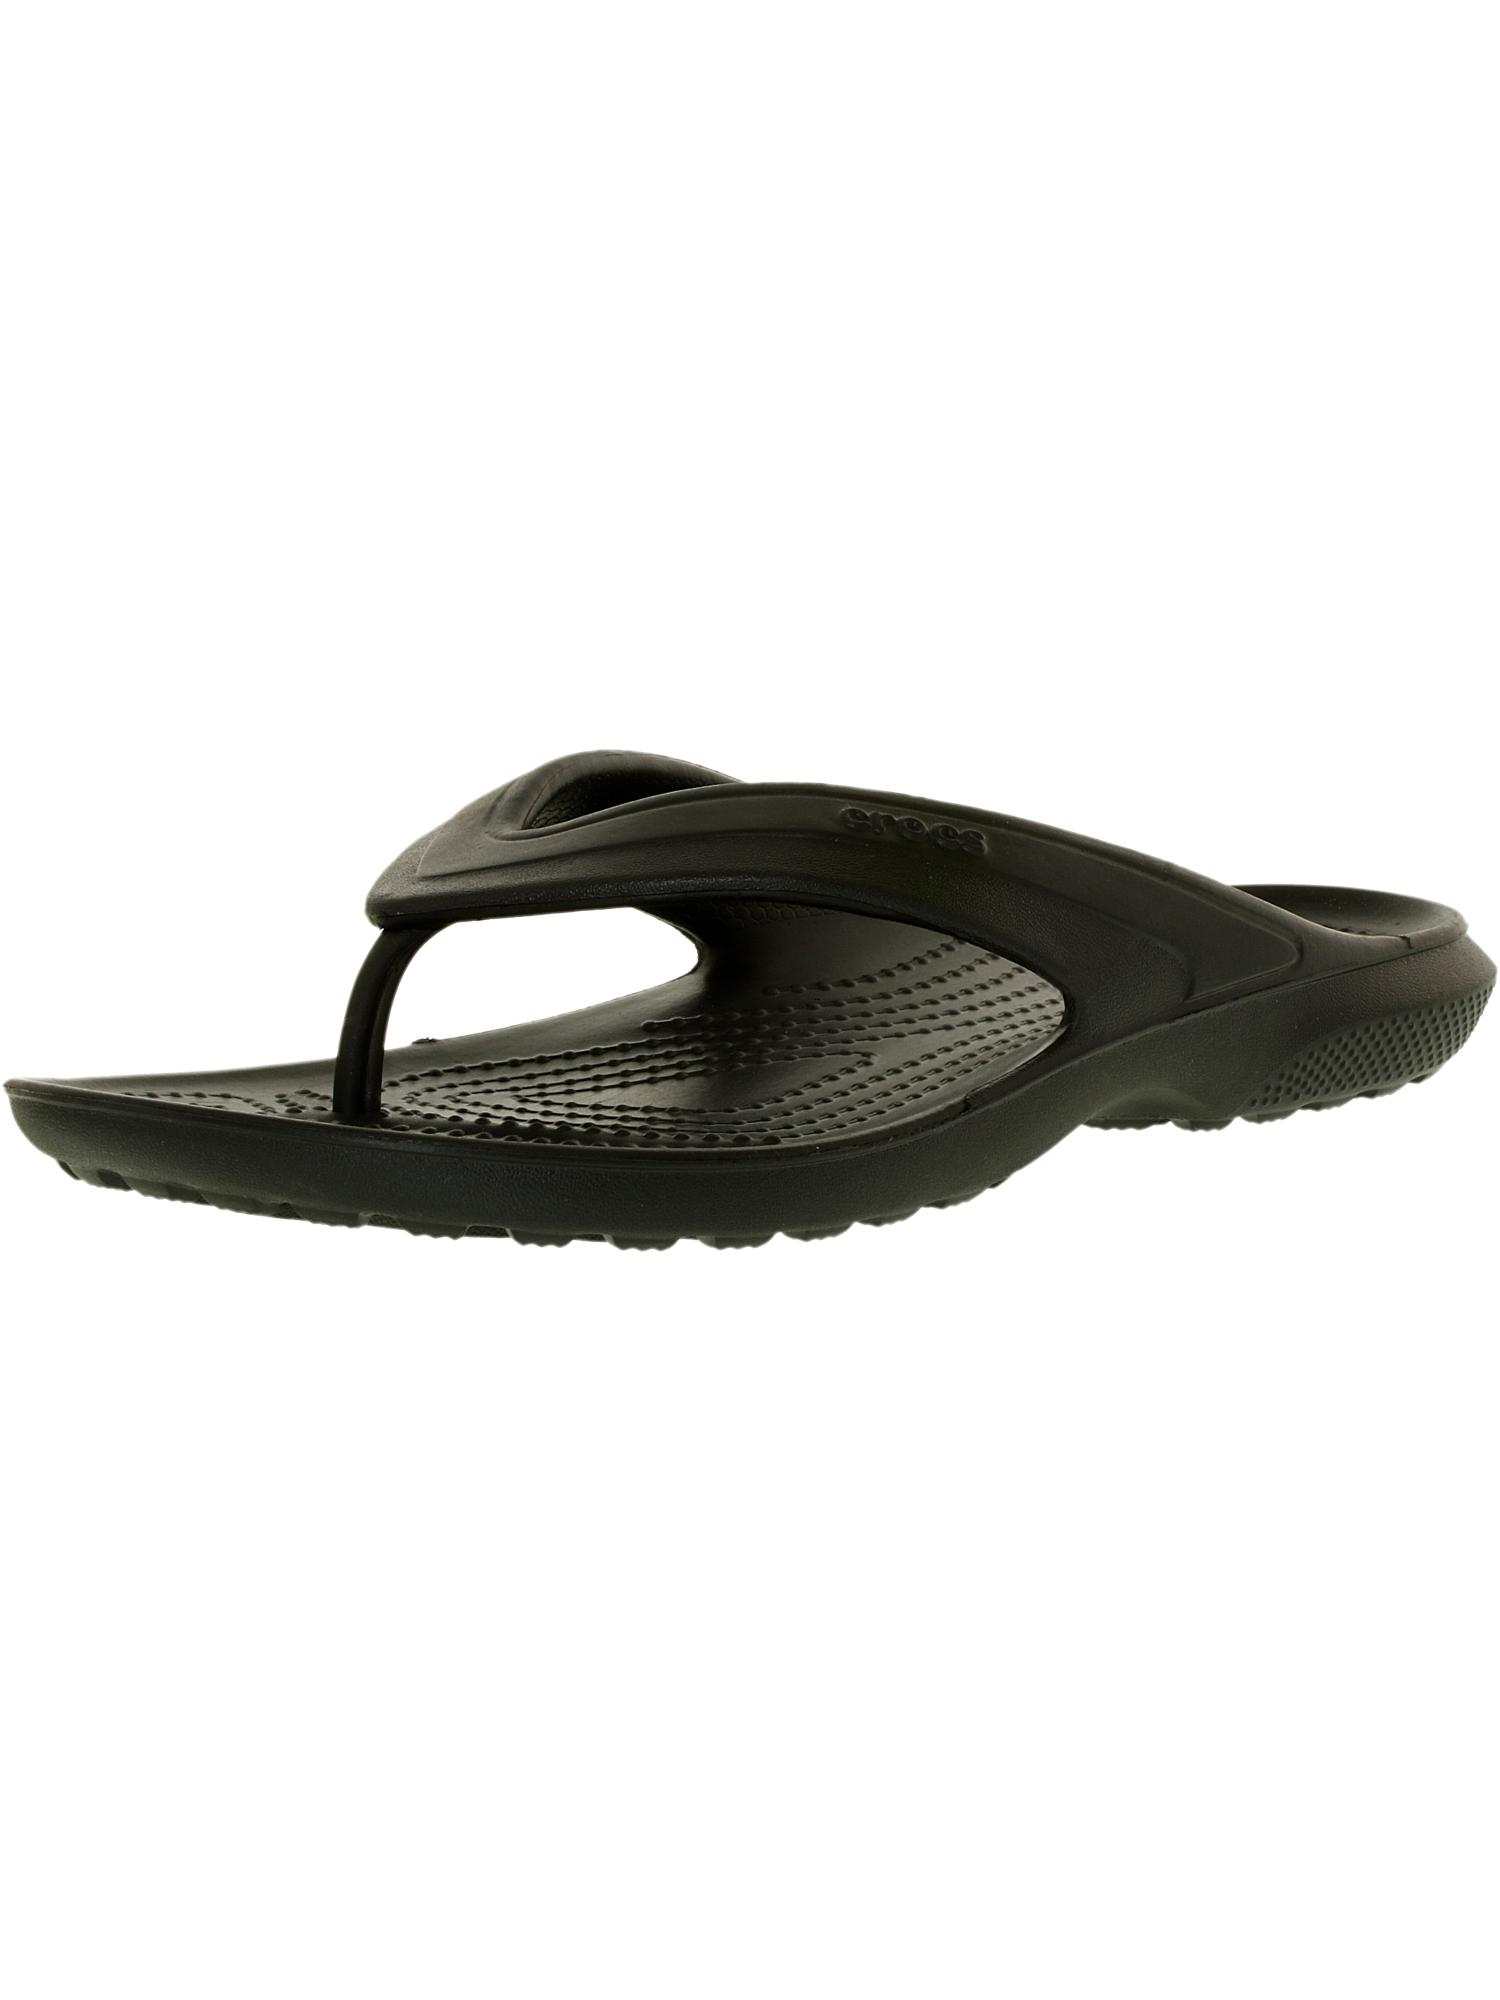 Image is loading Crocs-Men-039-s-Classic-Flip-Ankle-High-